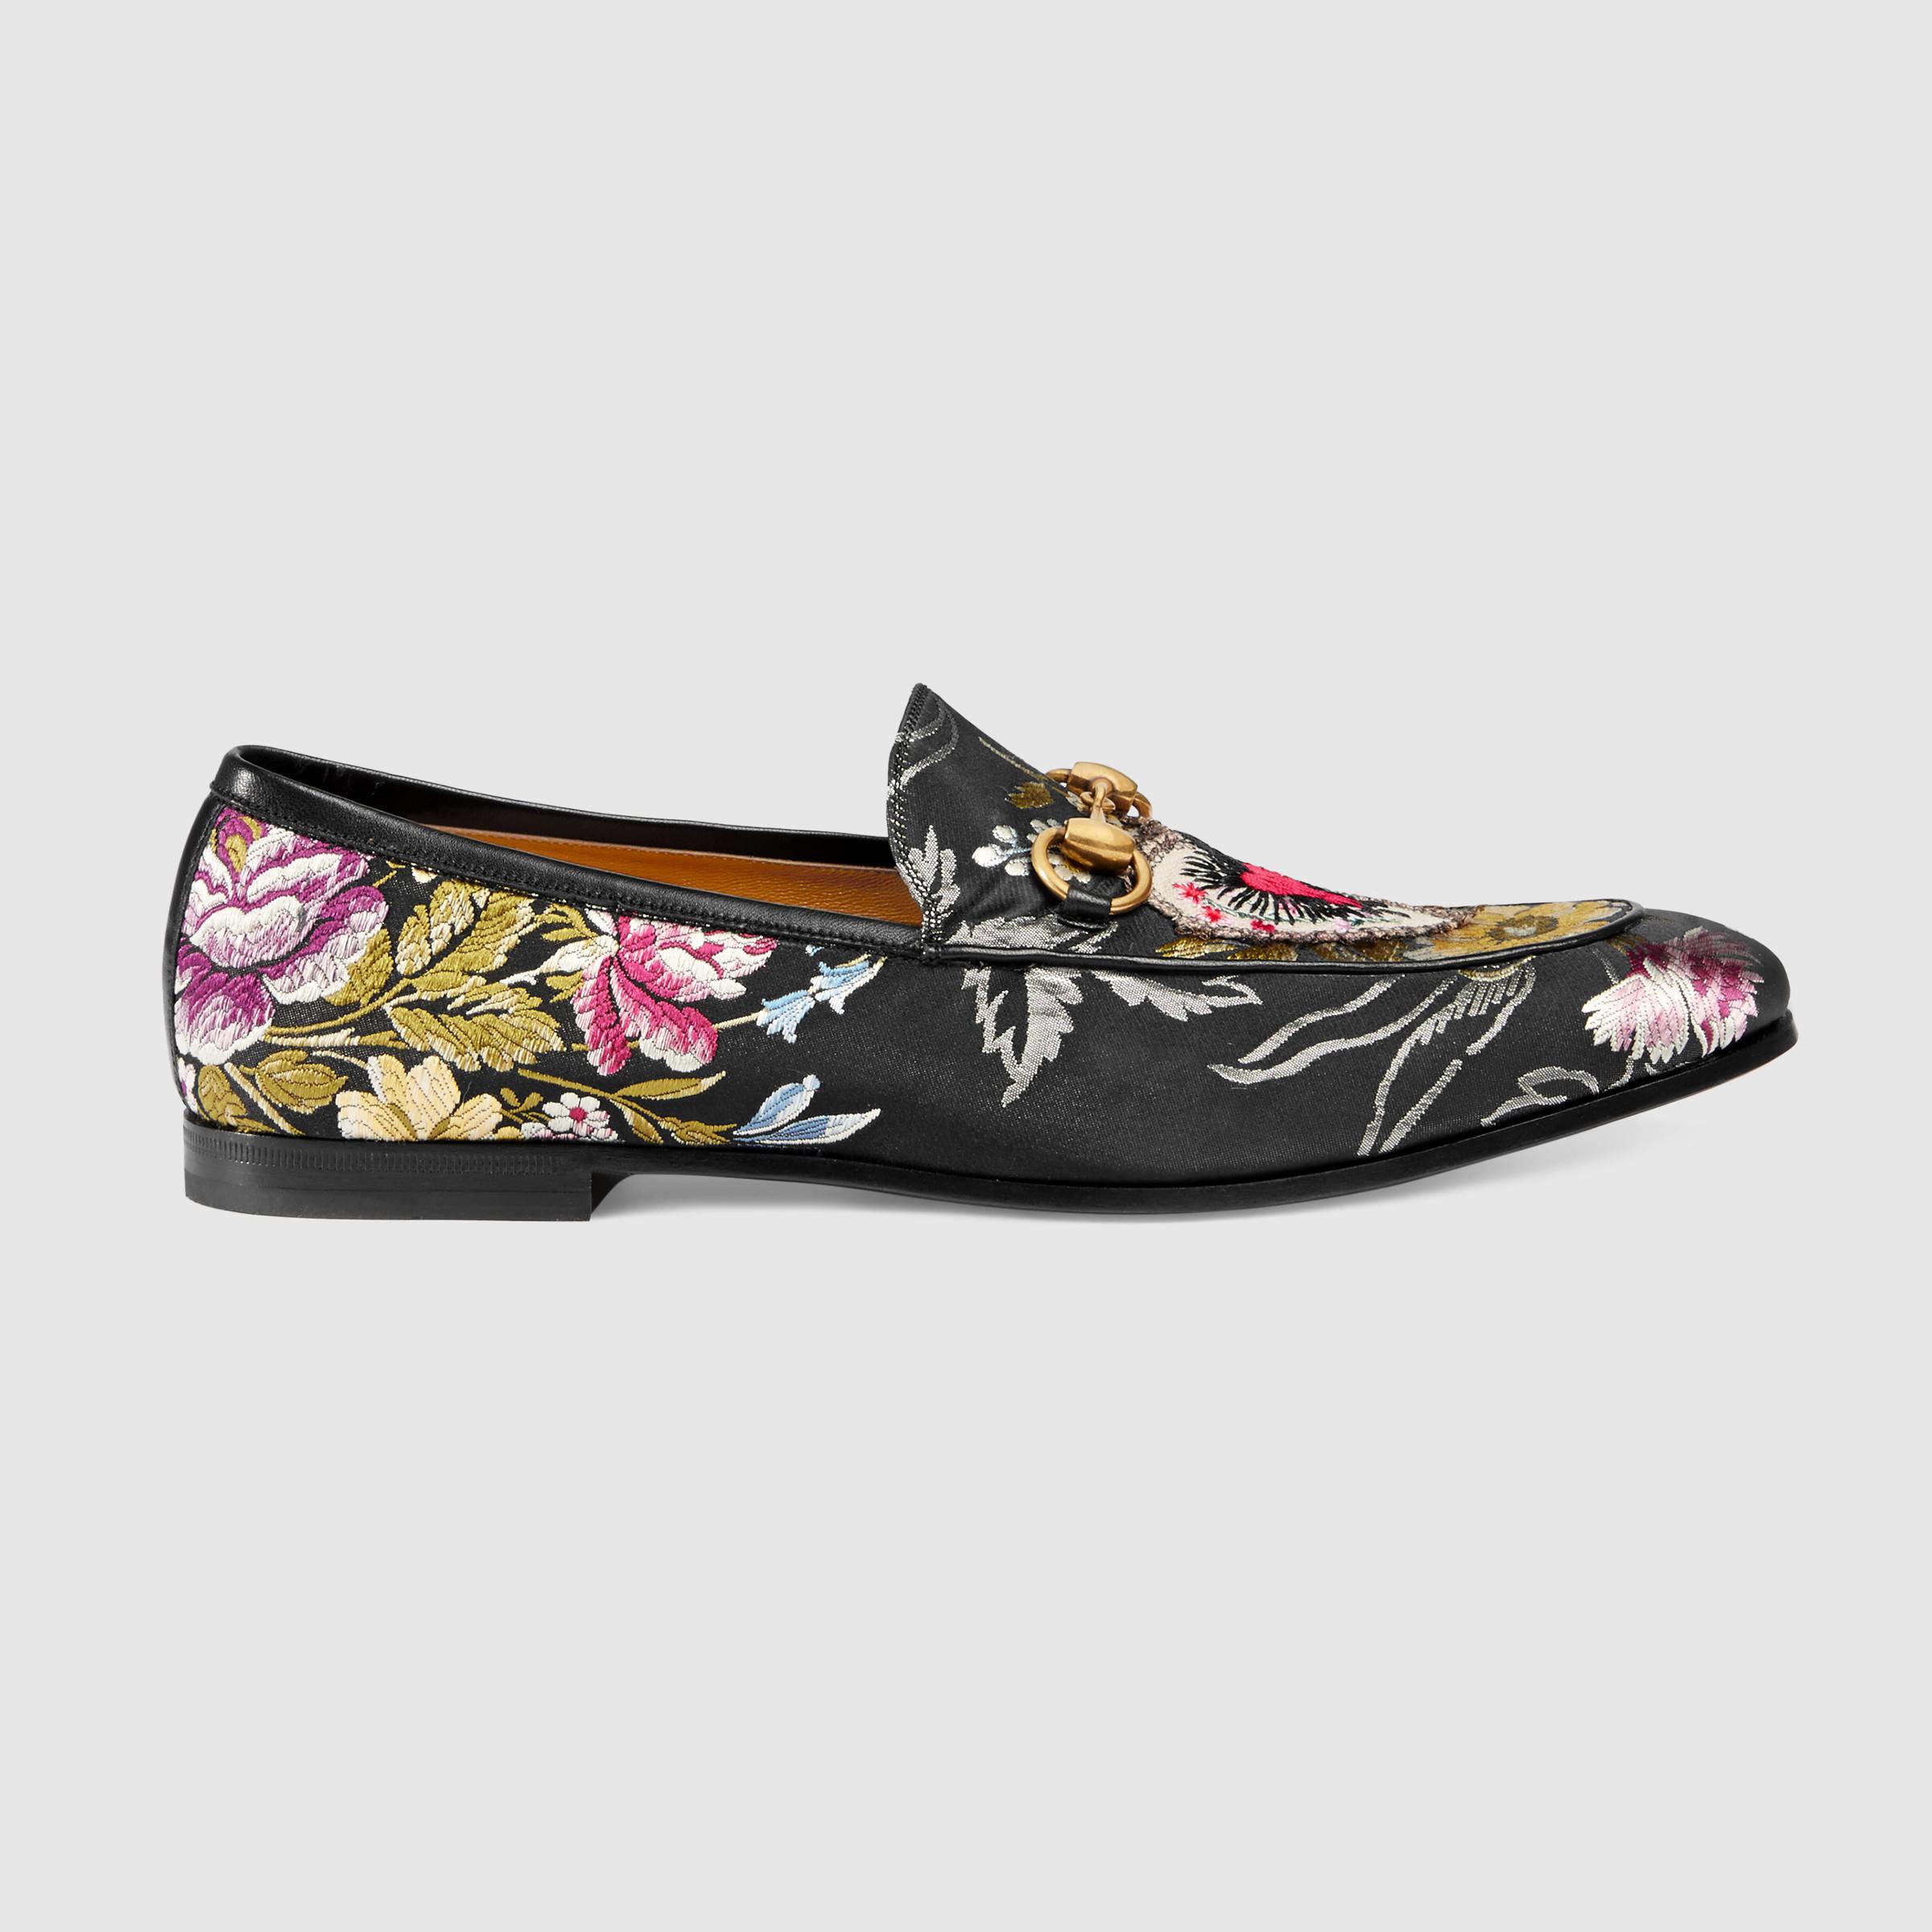 b7a7e7266 Gucci Jordaan Floral Jacquard Loafer in Black for Men - Lyst